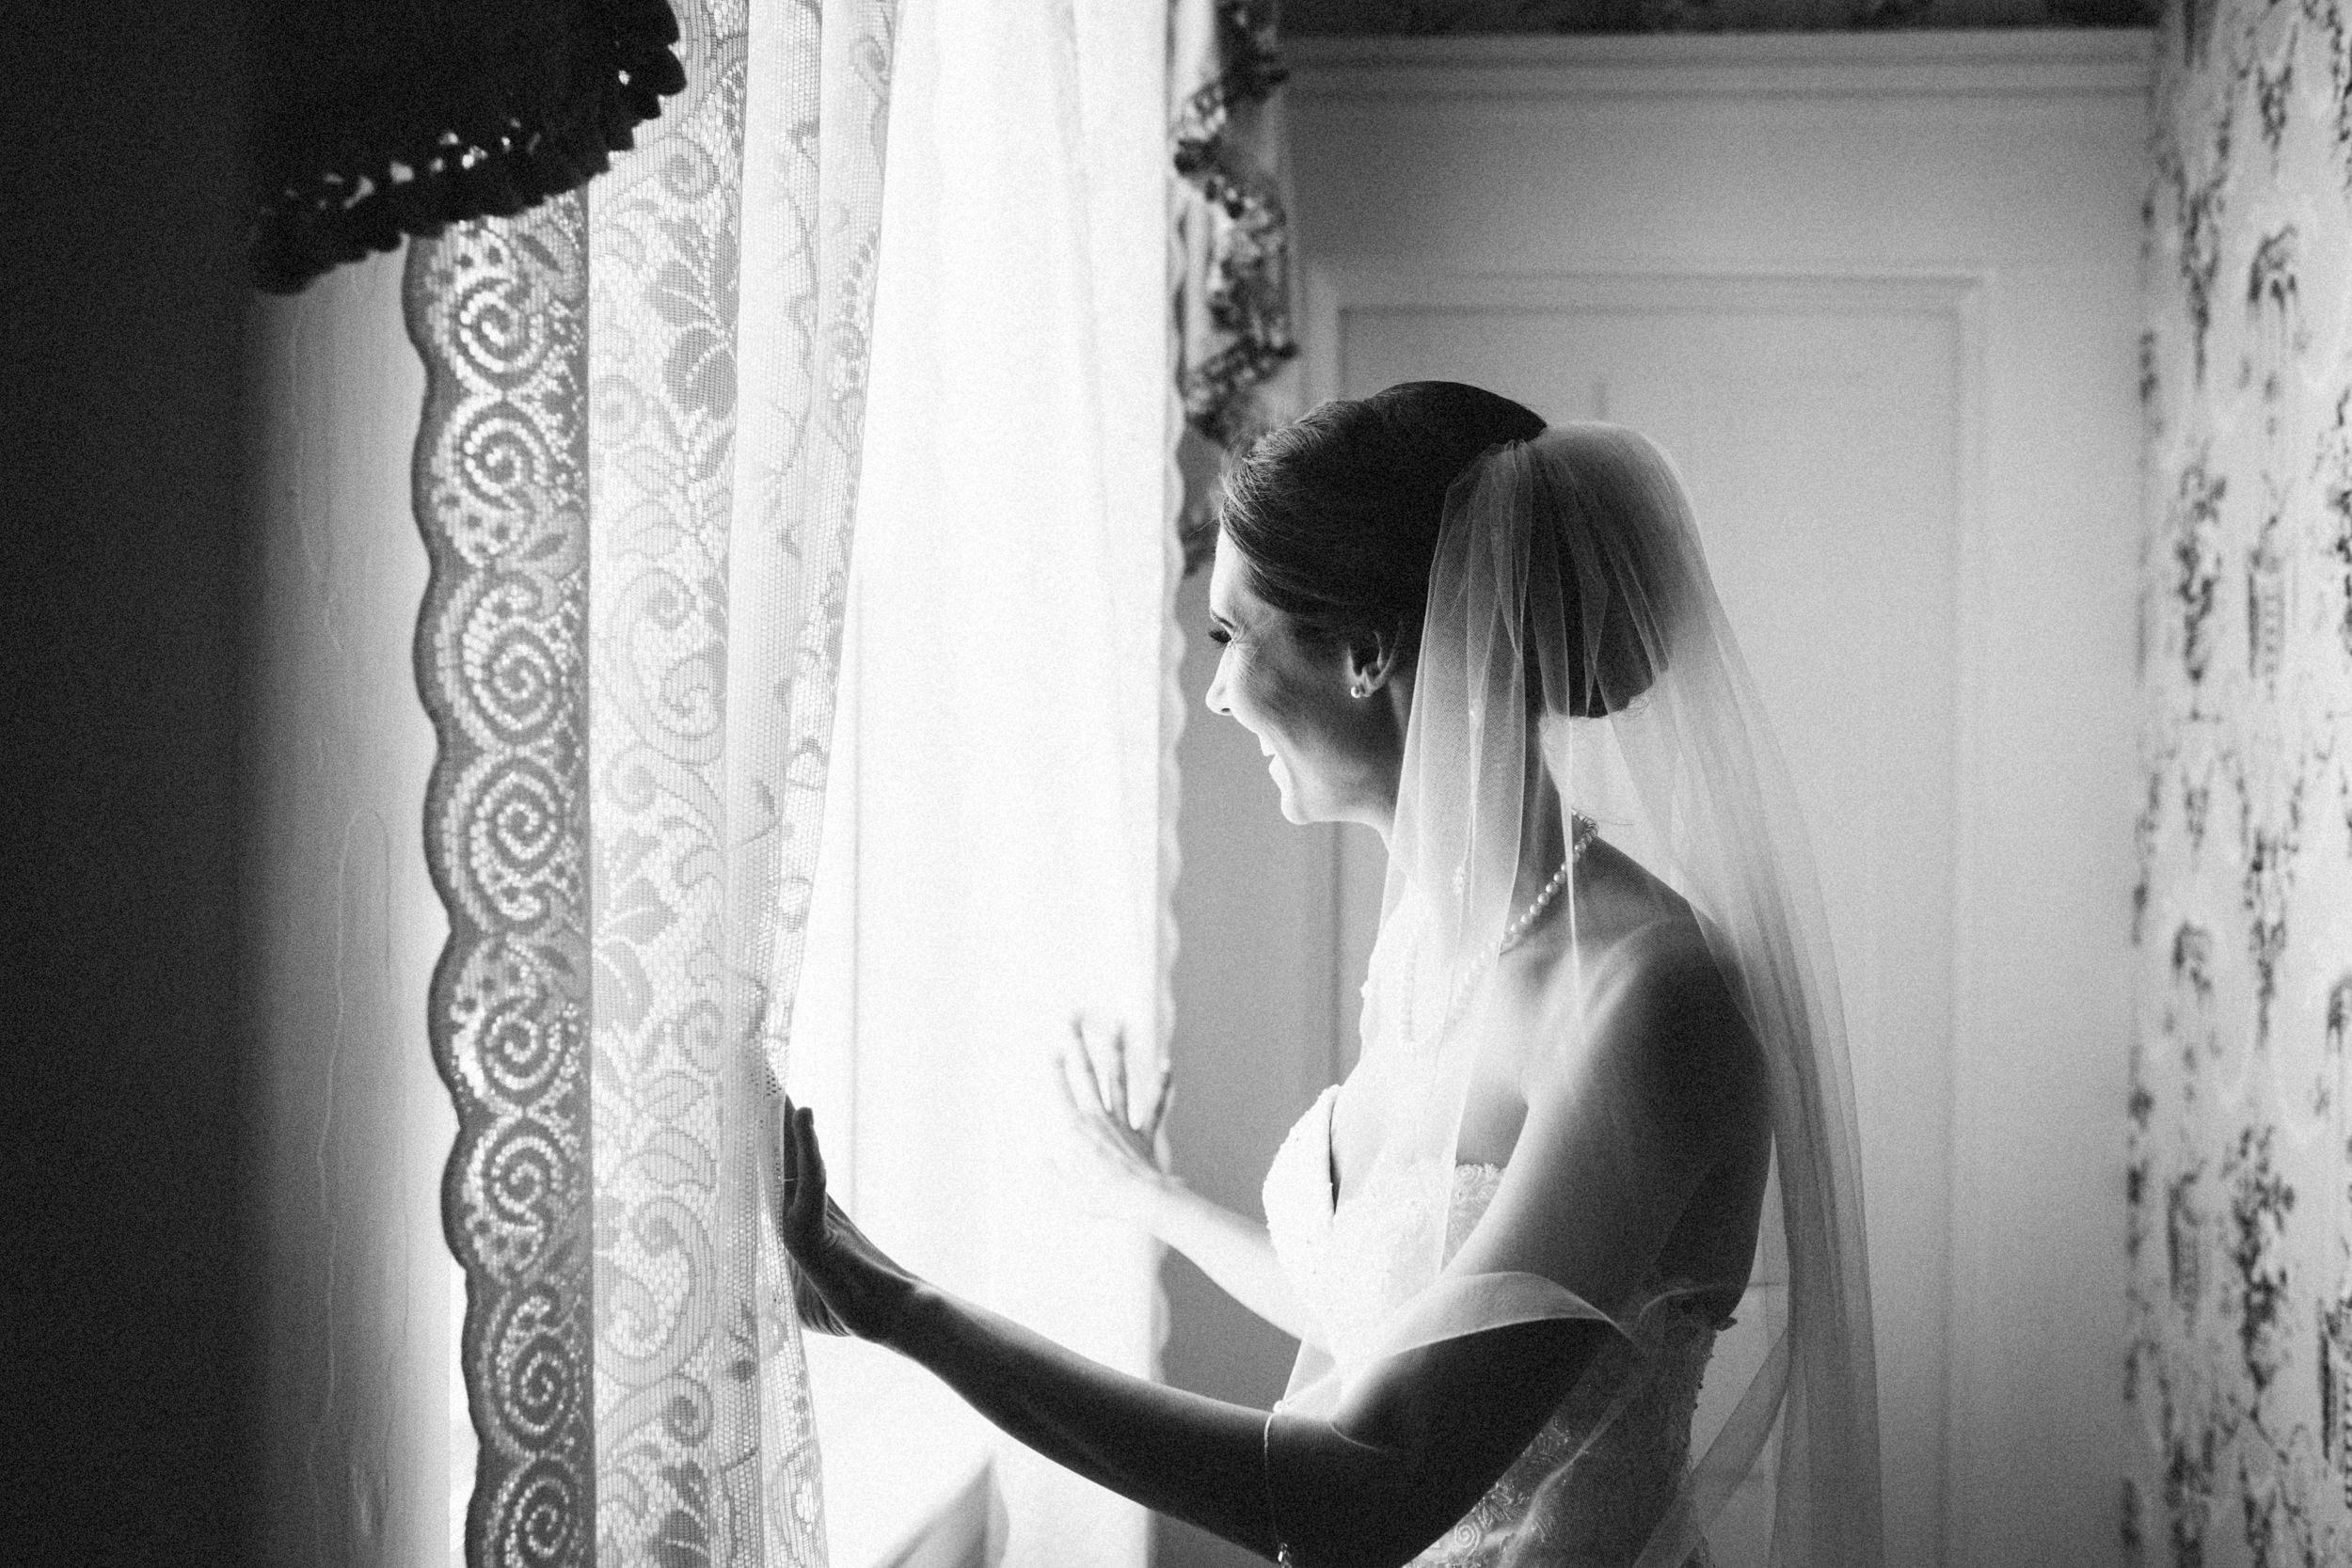 Louisville-Kentucky-Wedding-Elopement-Photographer-Sarah-Katherine-Davis-Photography-Whitehall-Classic-Timeless-Garden-Wedding-257.jpg